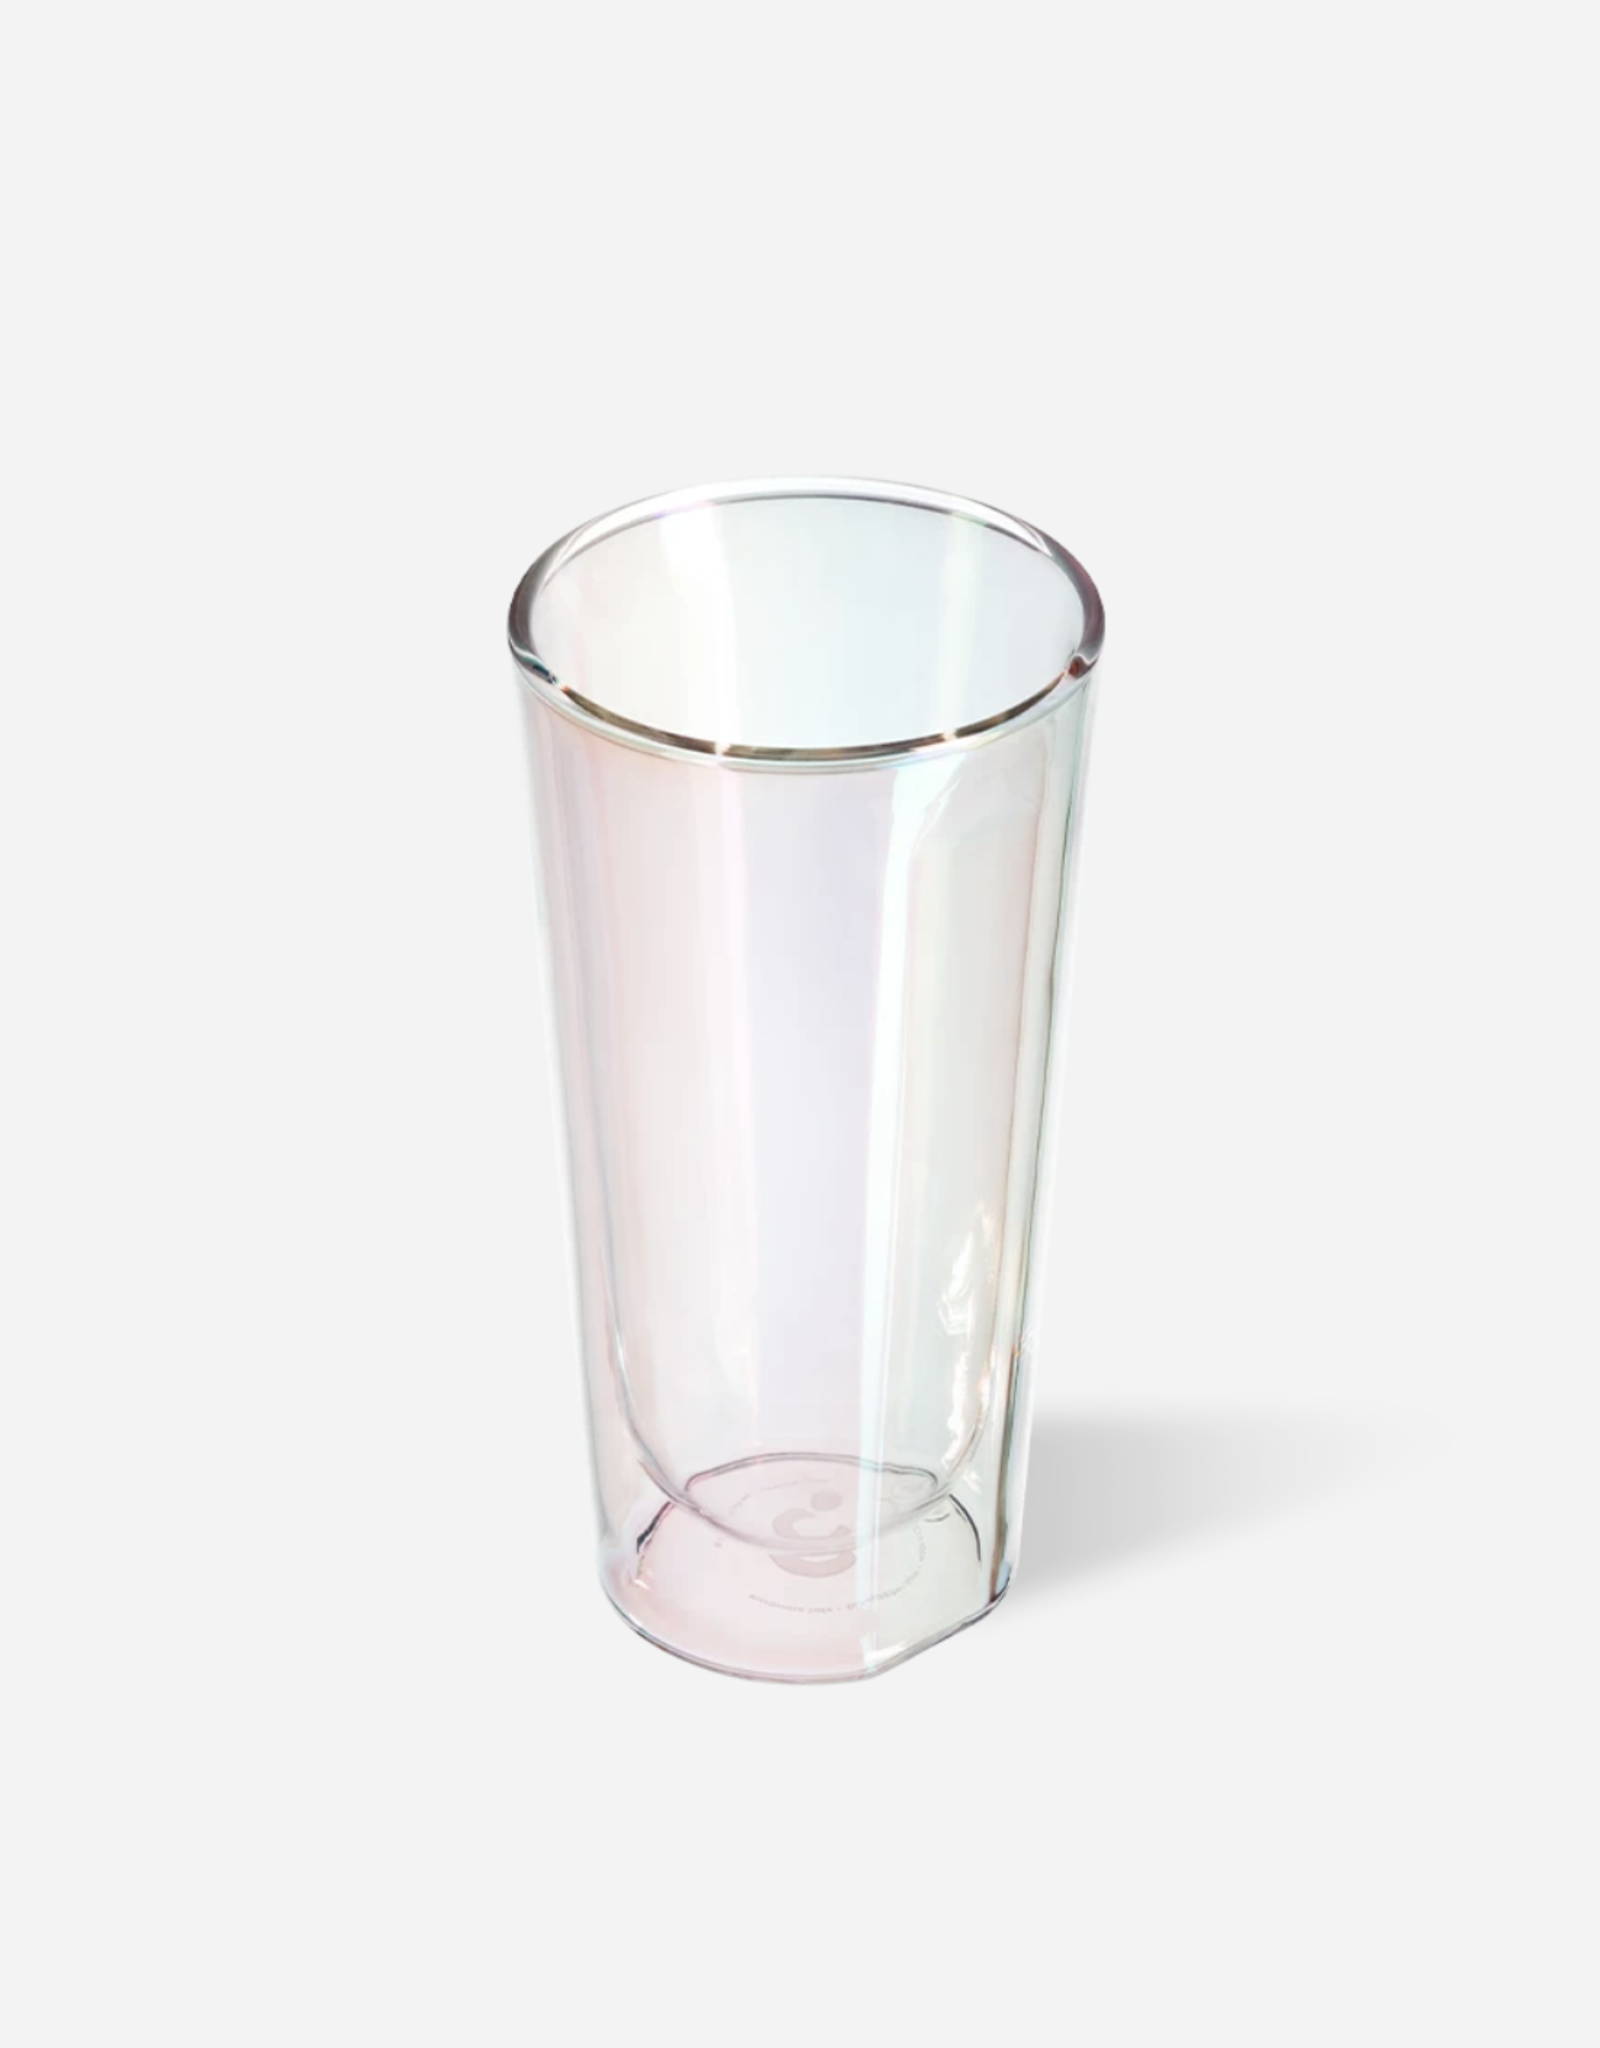 Corkcicle Corkcicle Pint Glass Set Clear